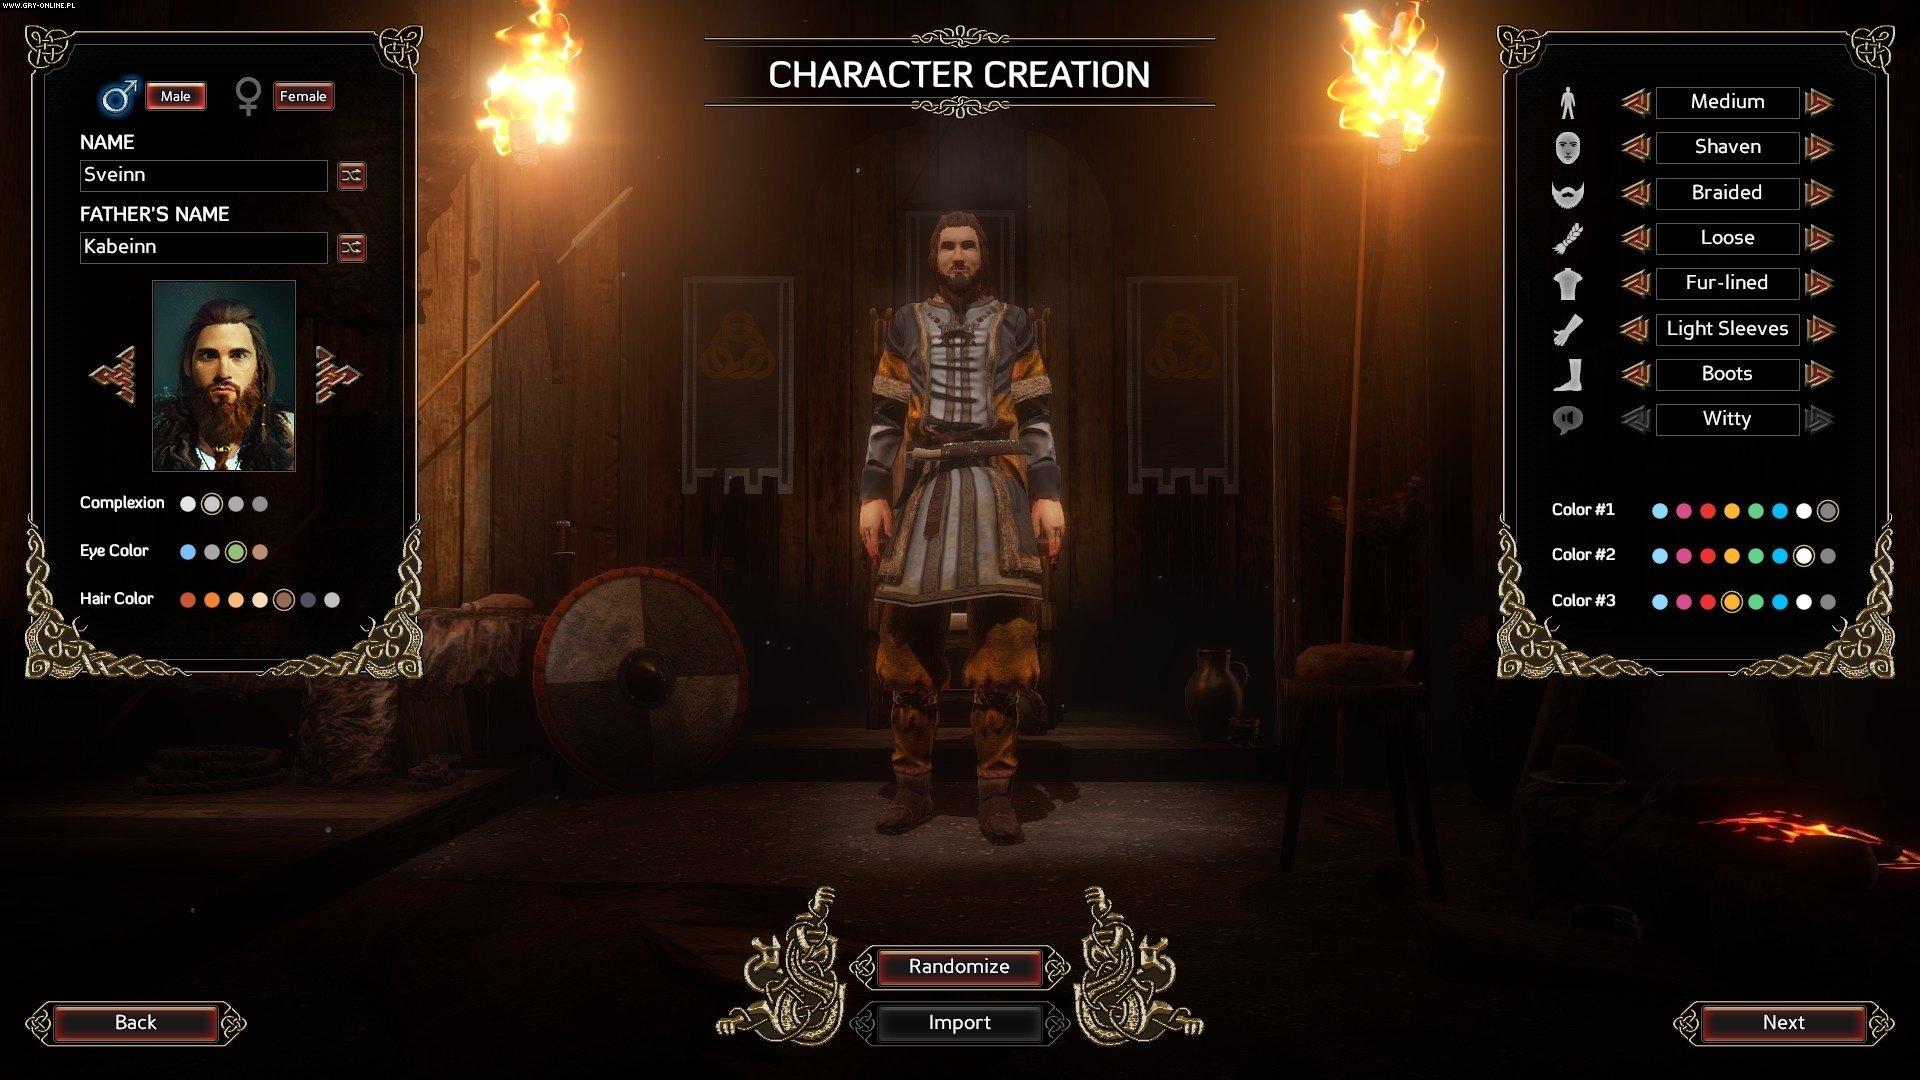 Expeditions: Viking PC Games Image 6/26, Logic Artists, IMGN.PRO